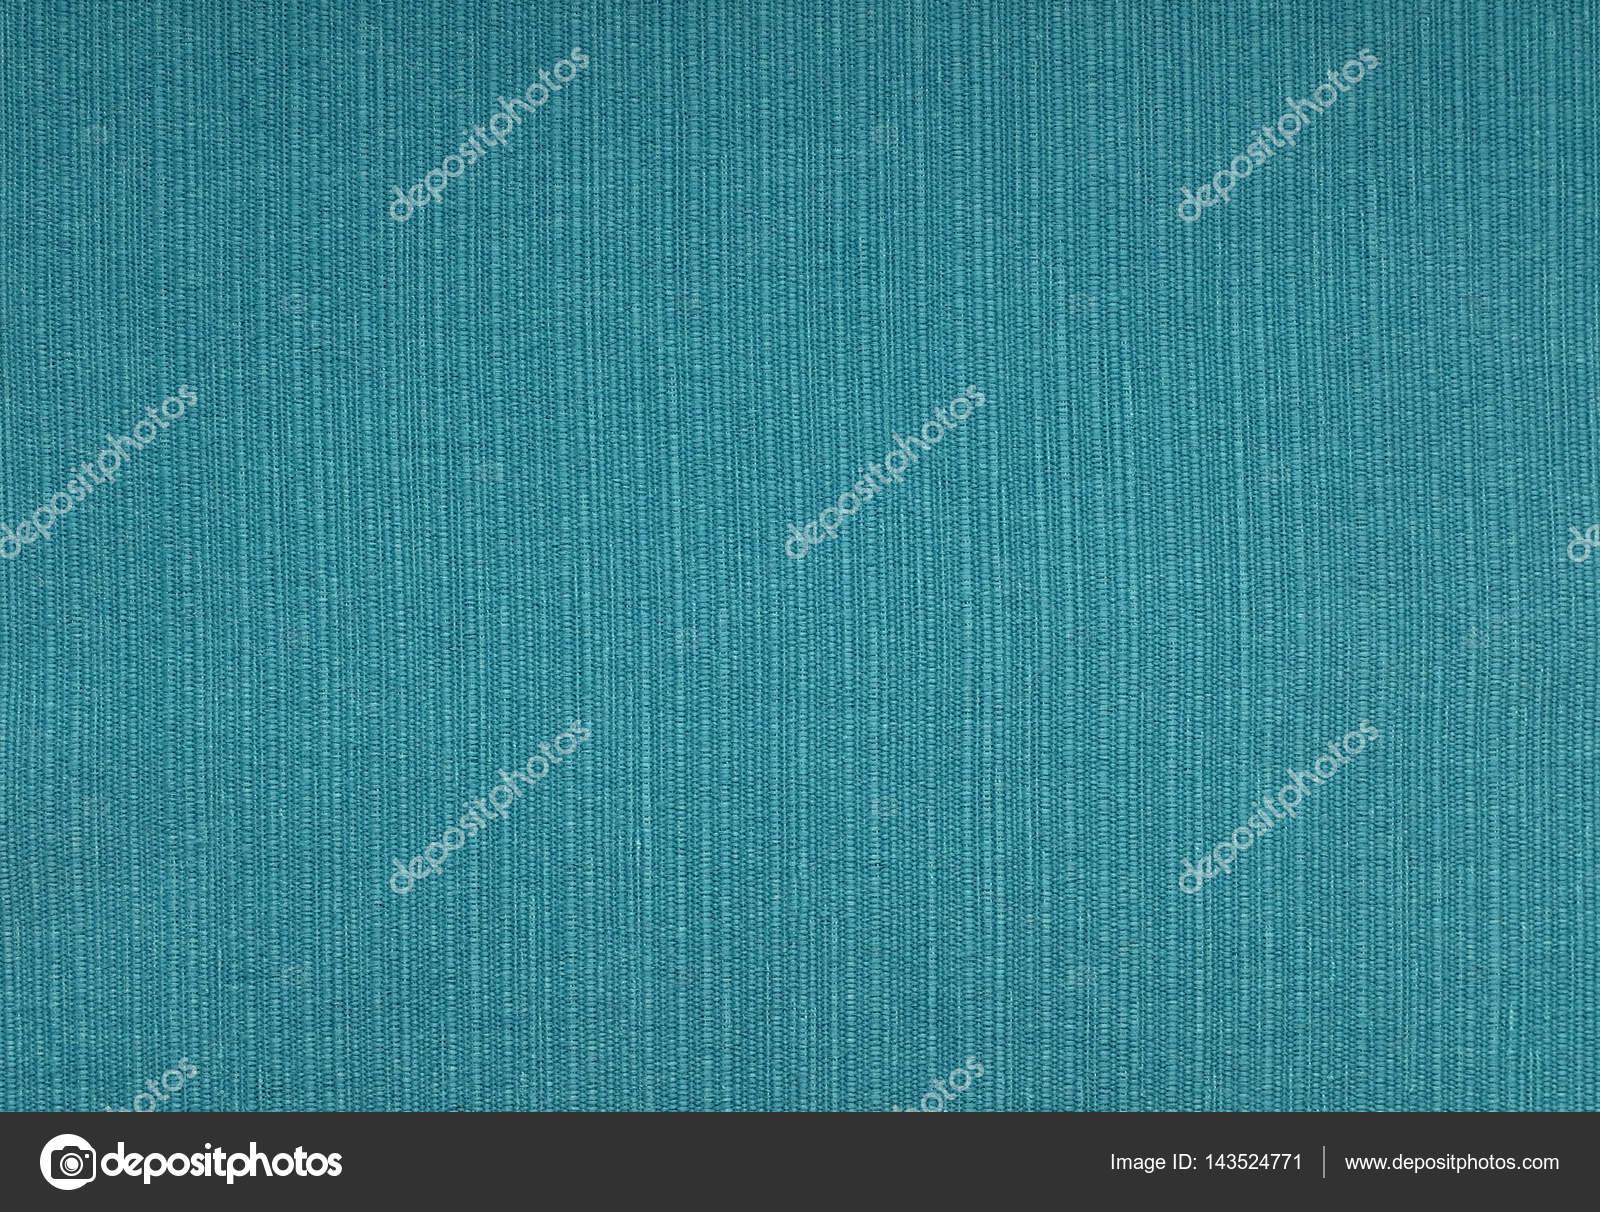 Sfondo Blu Turchese Grossolana Del Tessuto Foto Stock Sarahdoow